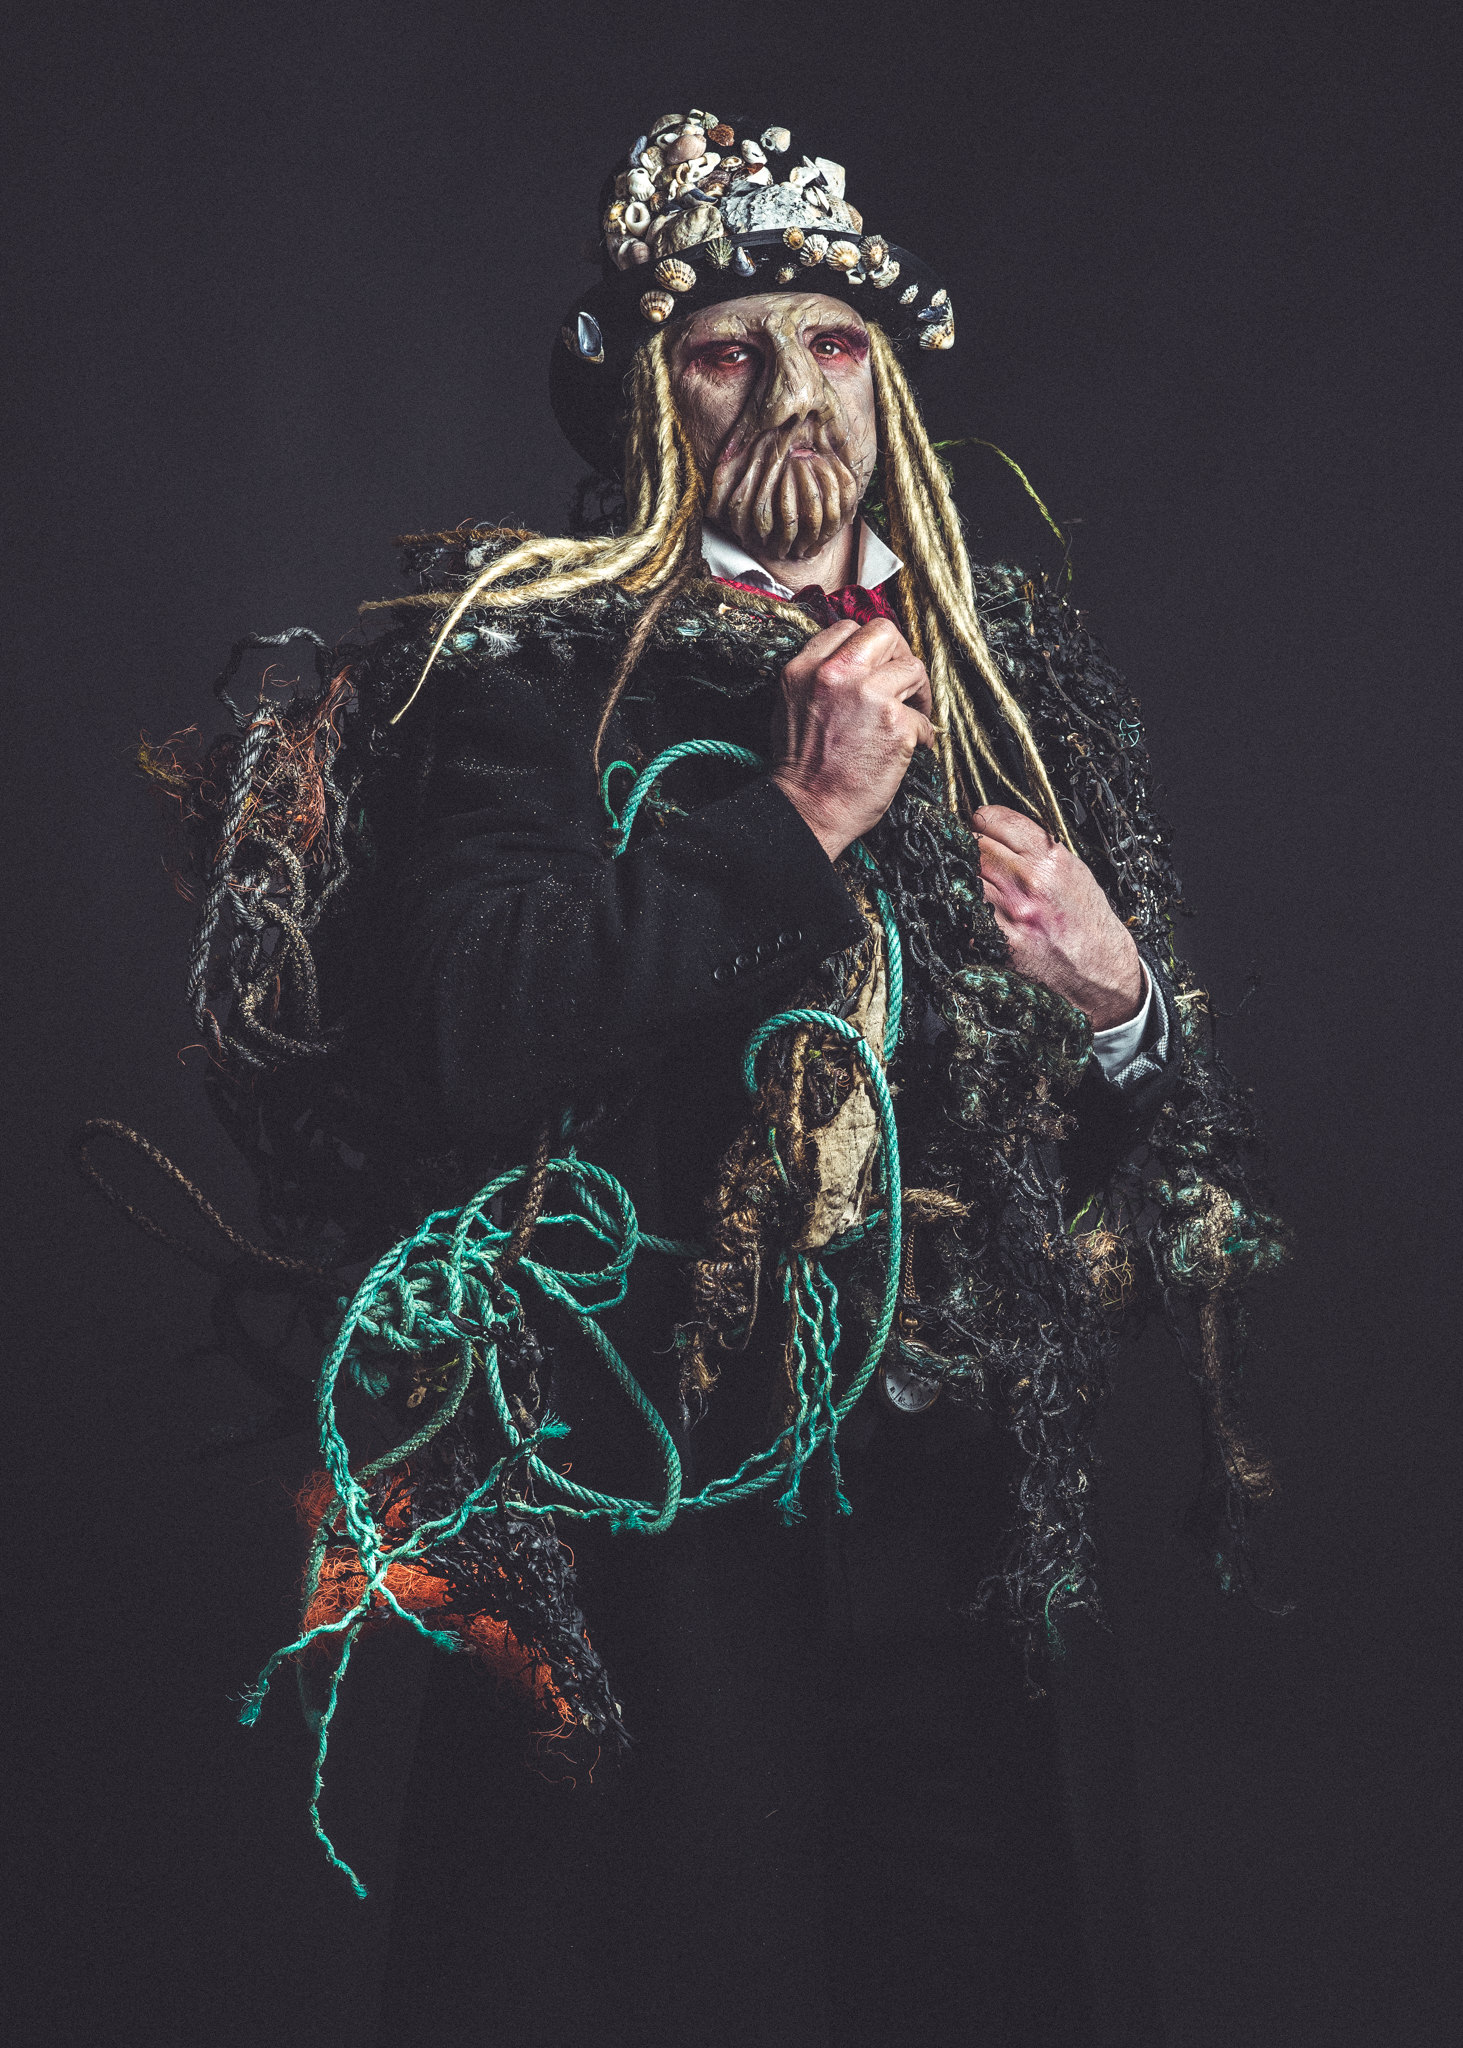 Animal-Instinct-Octopus-20170419-0090-Kris-Askey.jpg